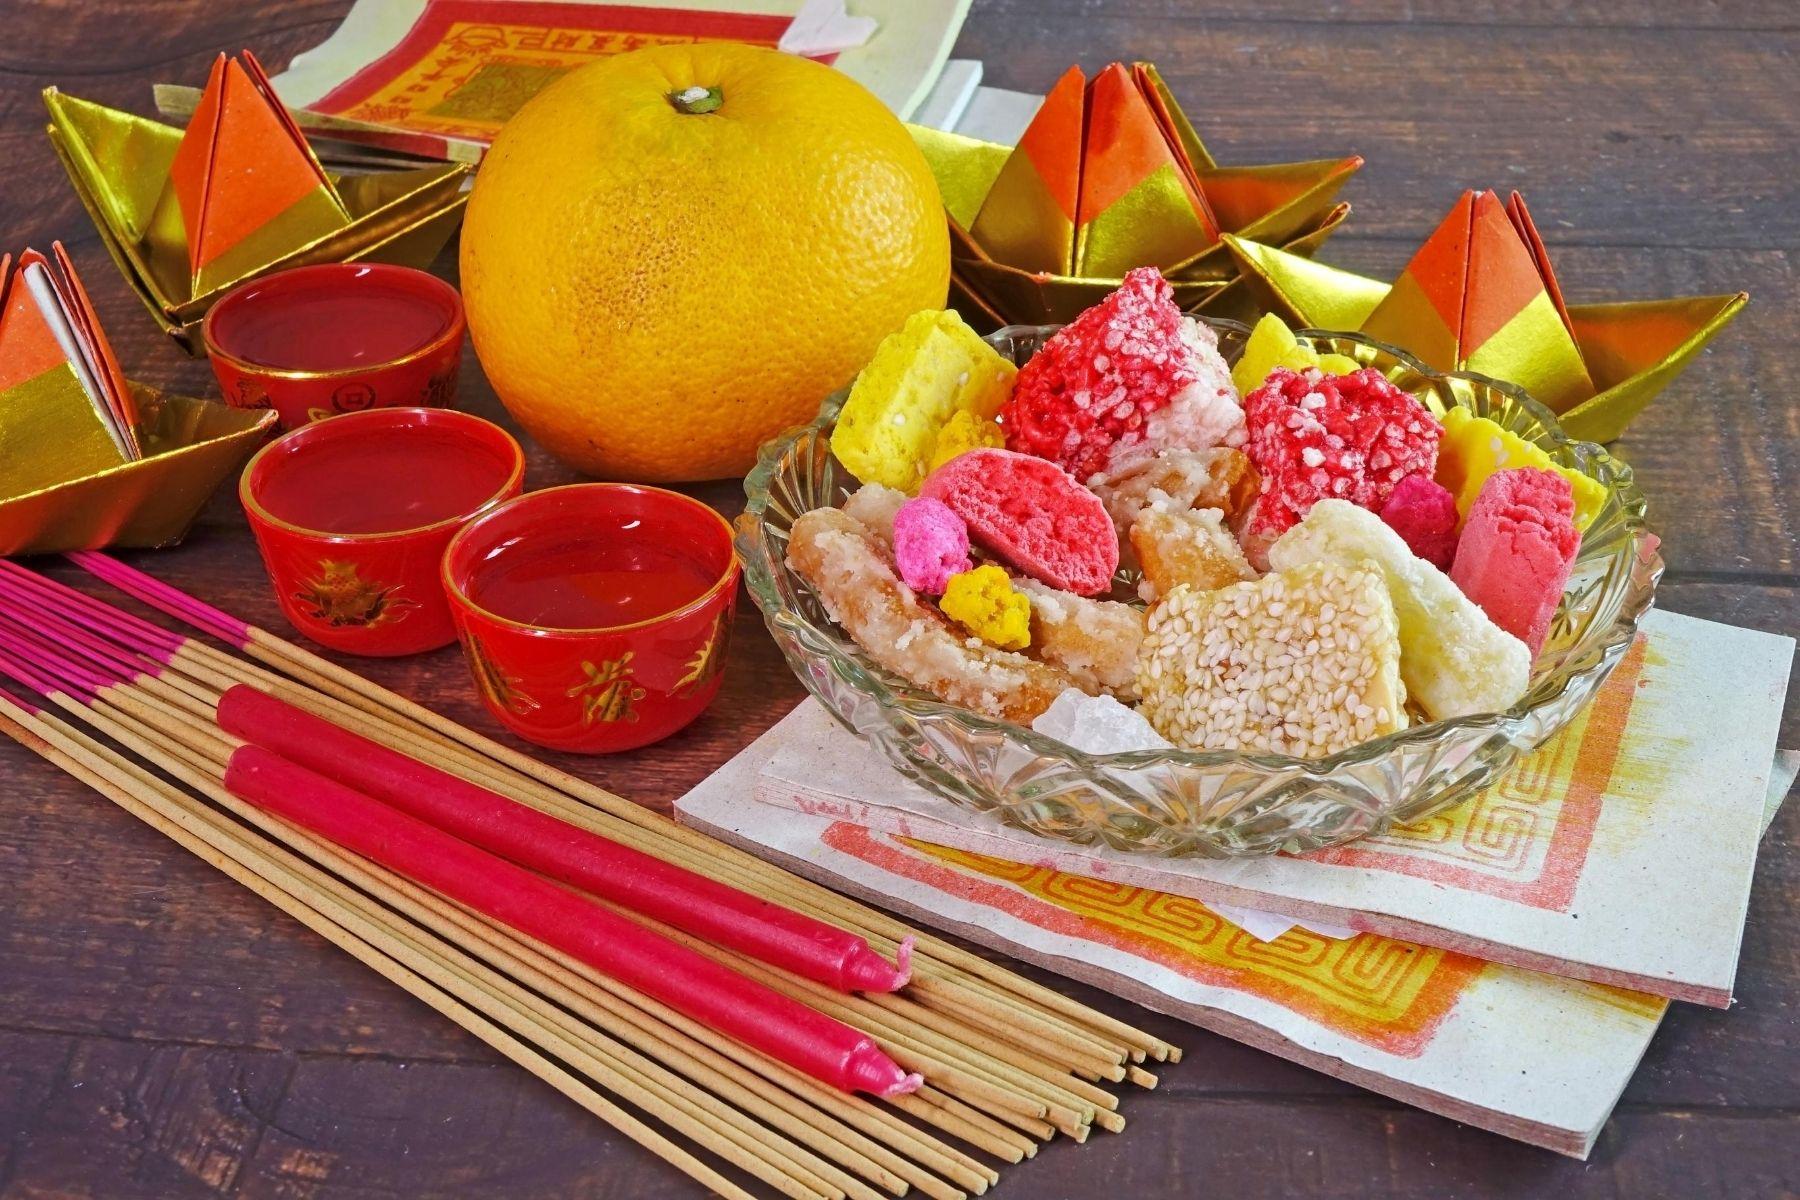 HappyFresh_Sacraficial_Foods_For_Spirit_Gourmet_Ceremony